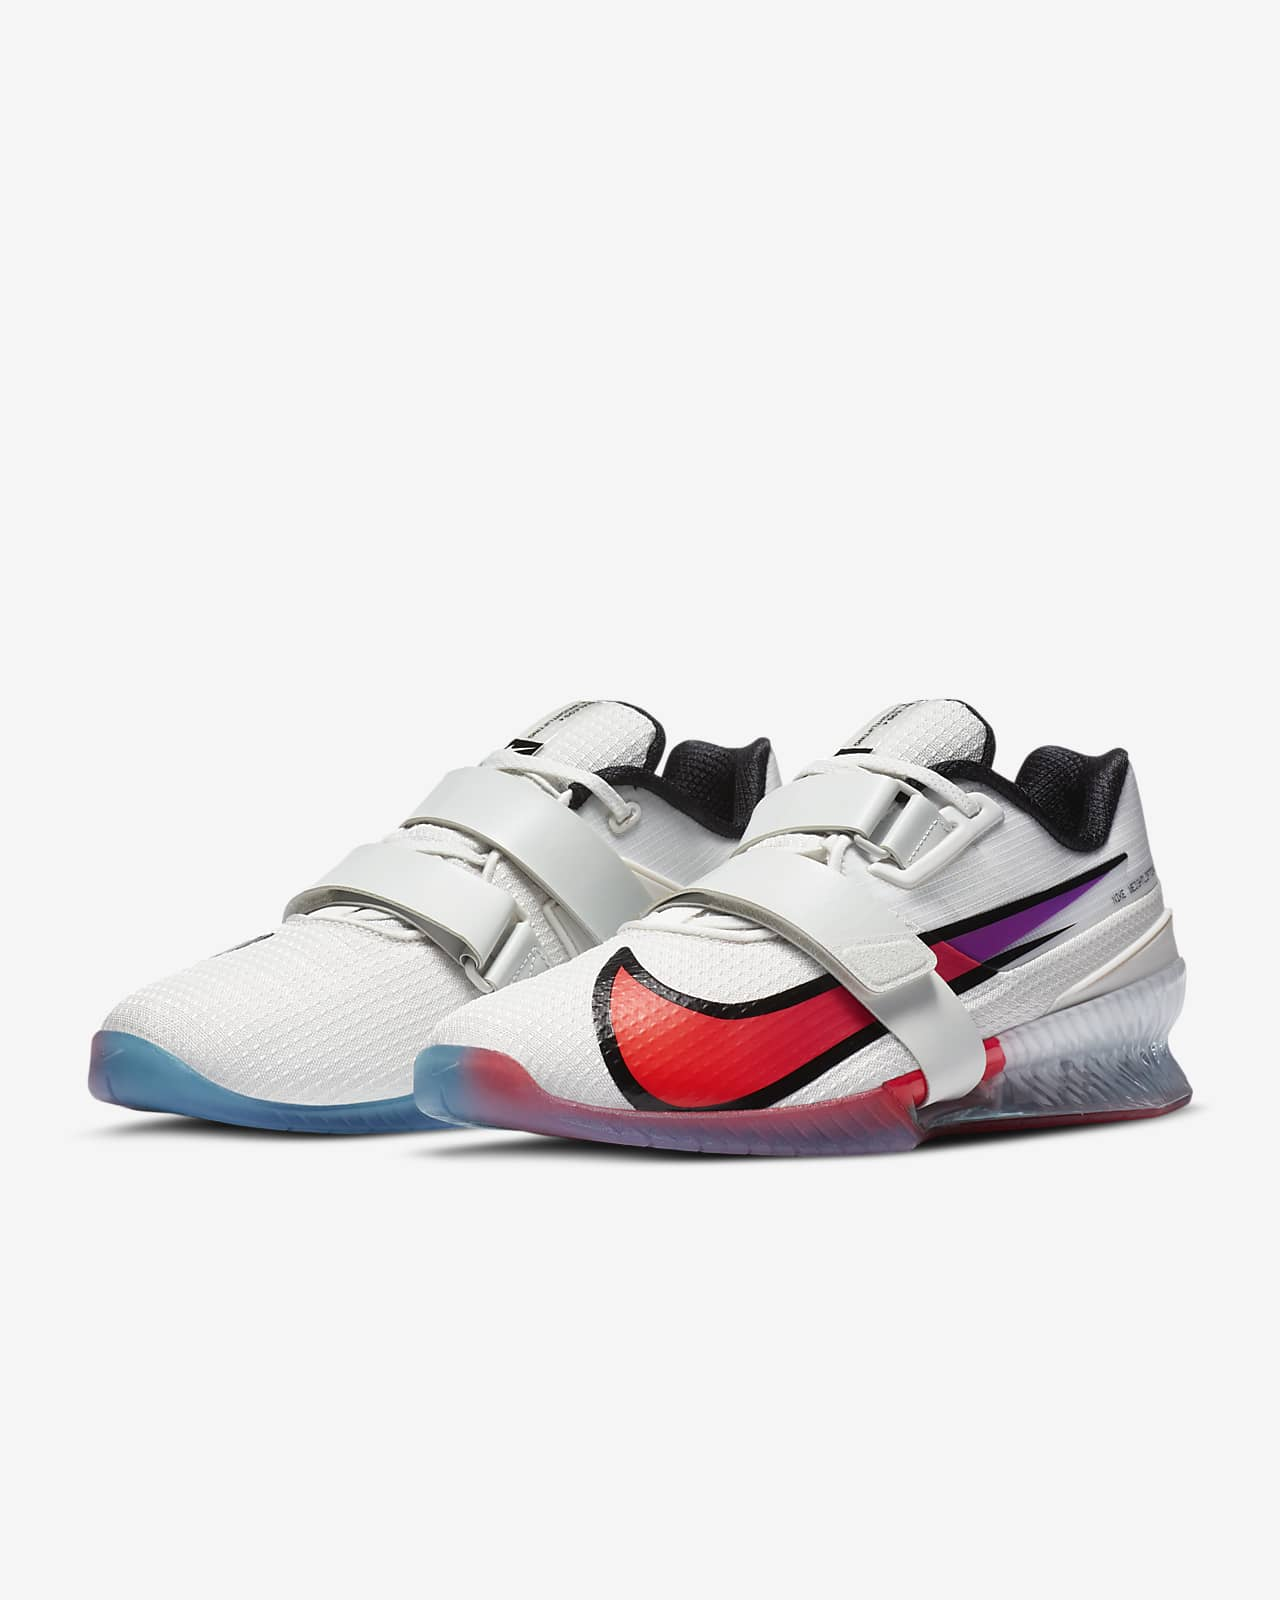 Nike Romaleos 4 SE Training Shoe. Nike SG